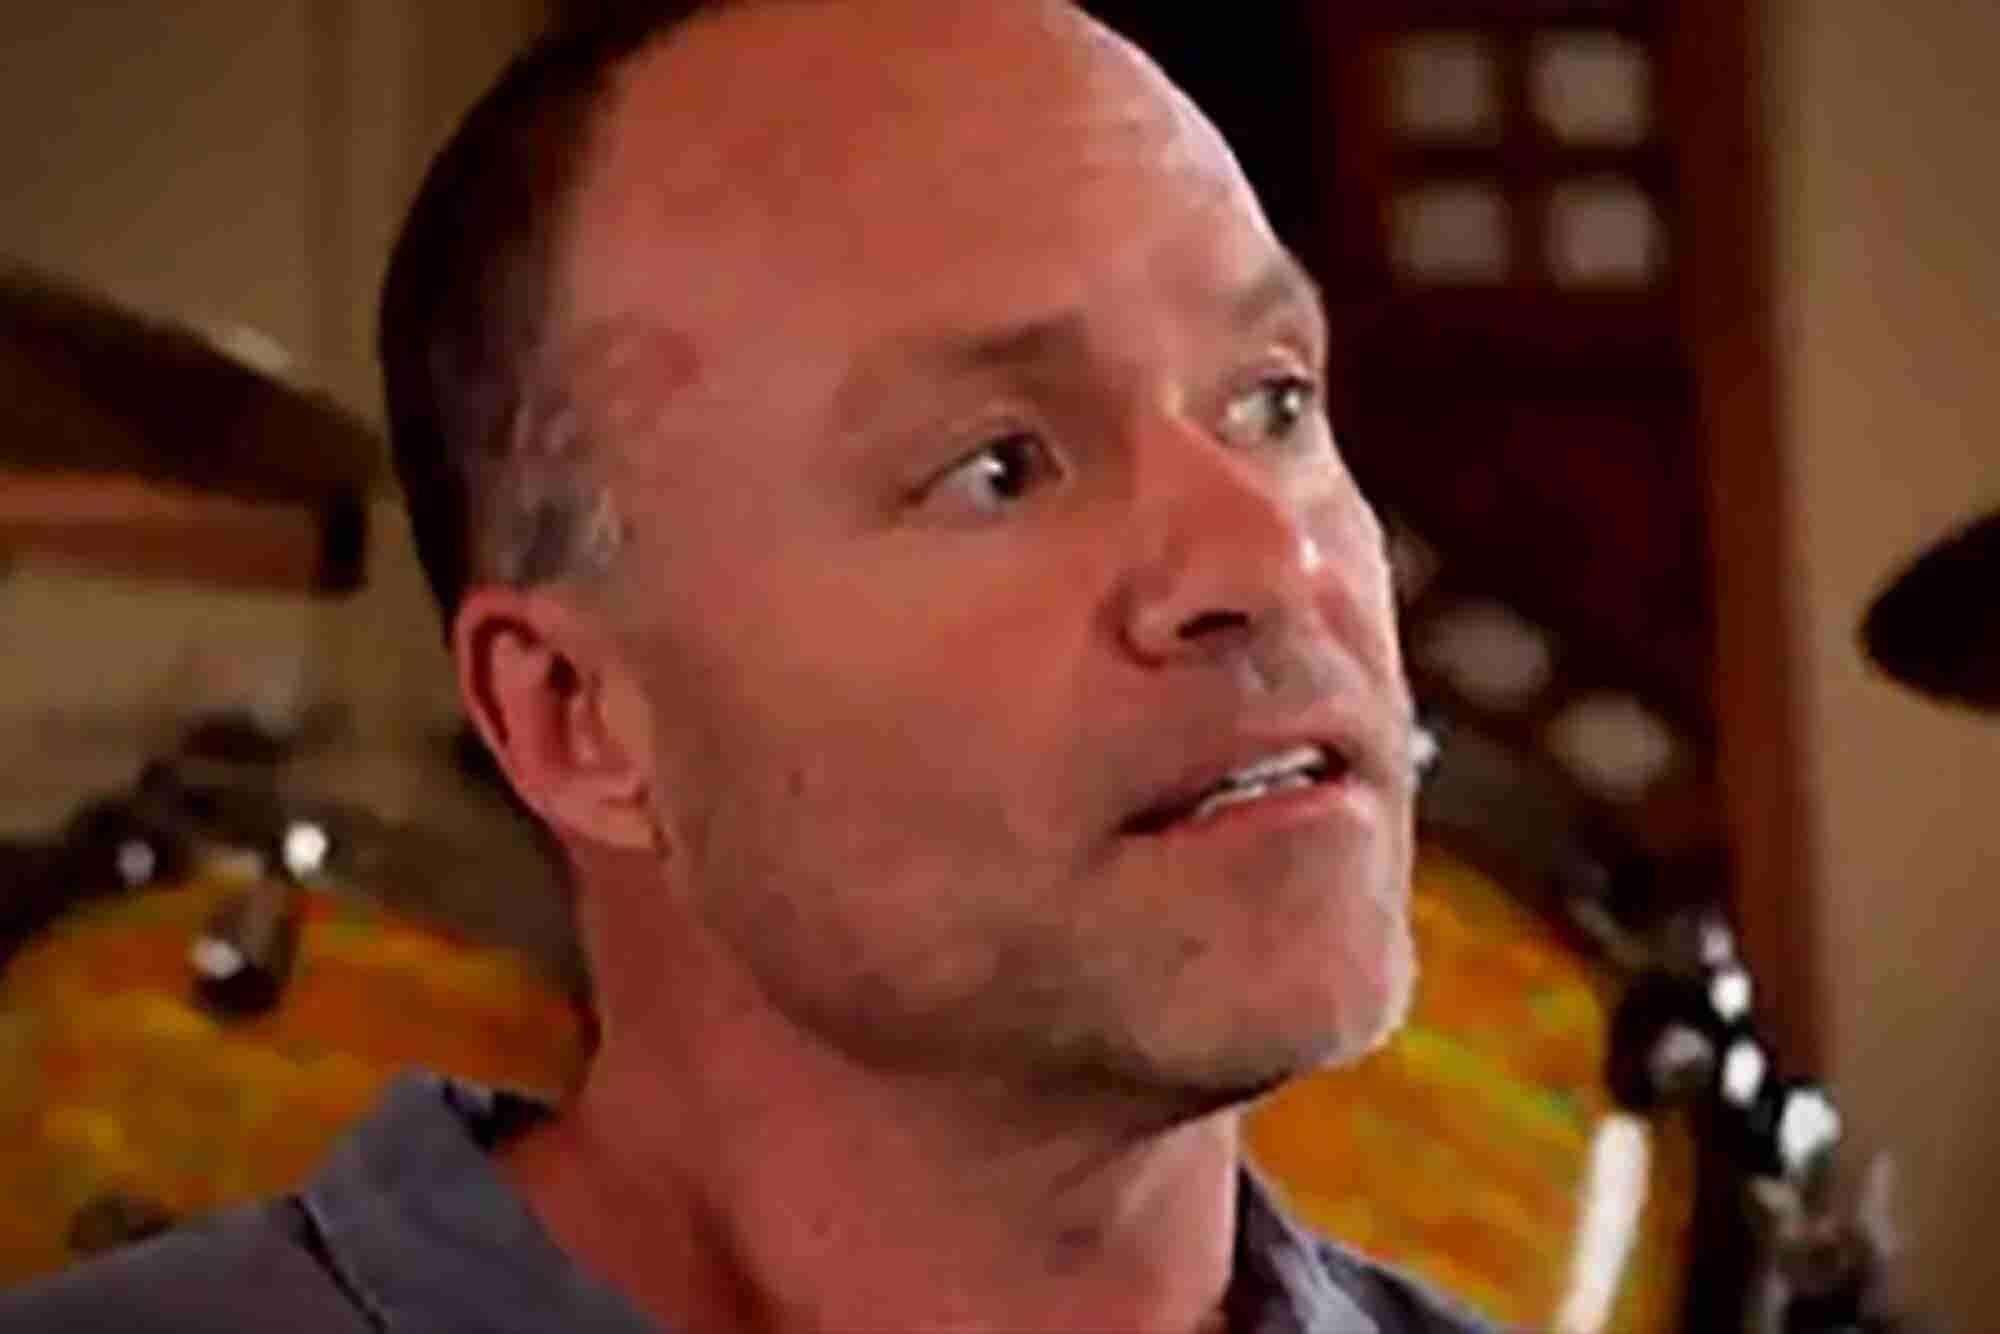 HomeAway Co-founder on Risks and Rewards of Super Bowl Ads